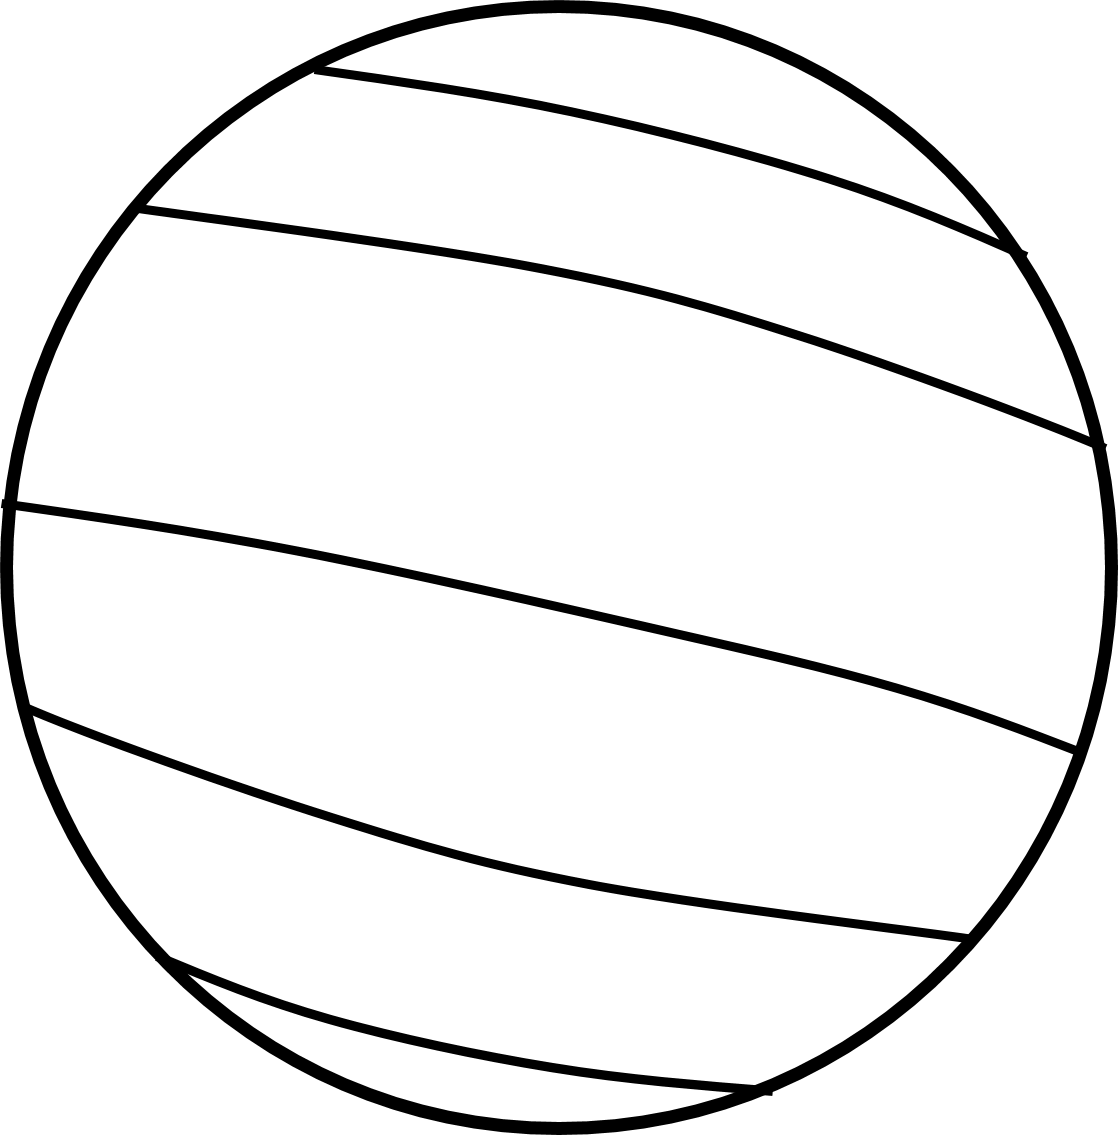 1118x1135 Jupiter Drawing Transparent For Free Download